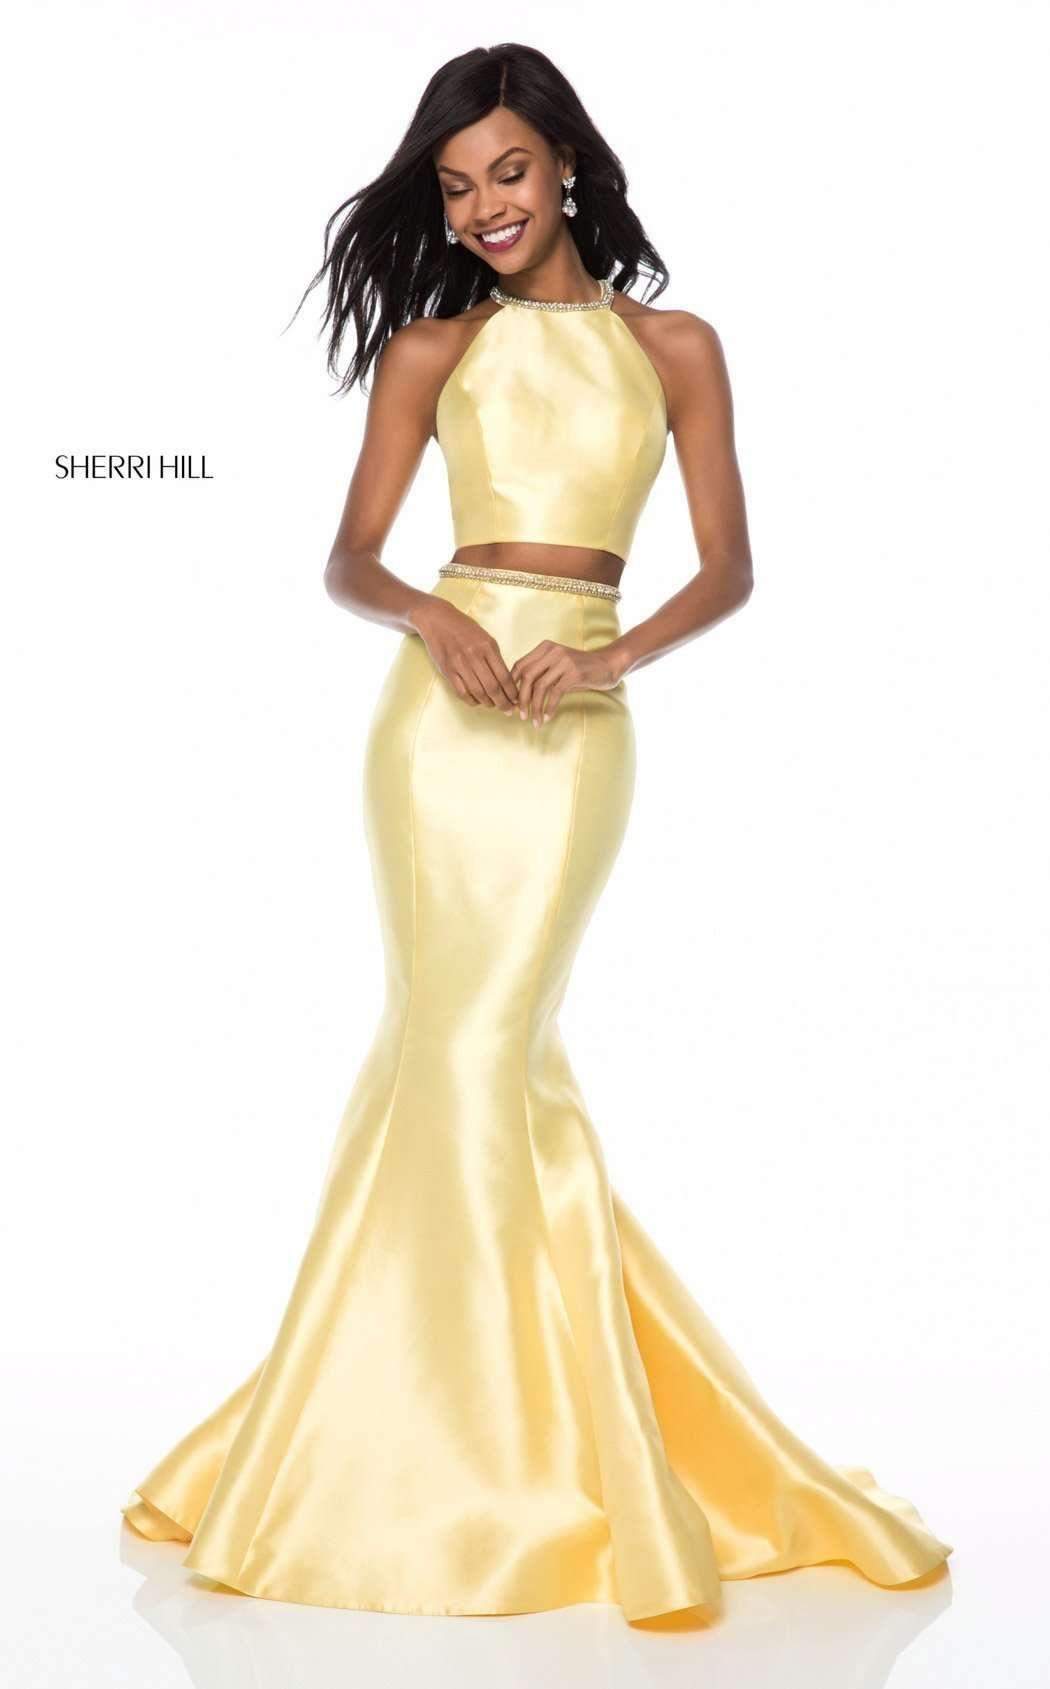 e5894addaf Sherri Hill 52024. Sherri Hill 52024 Designer Prom Dresses ...